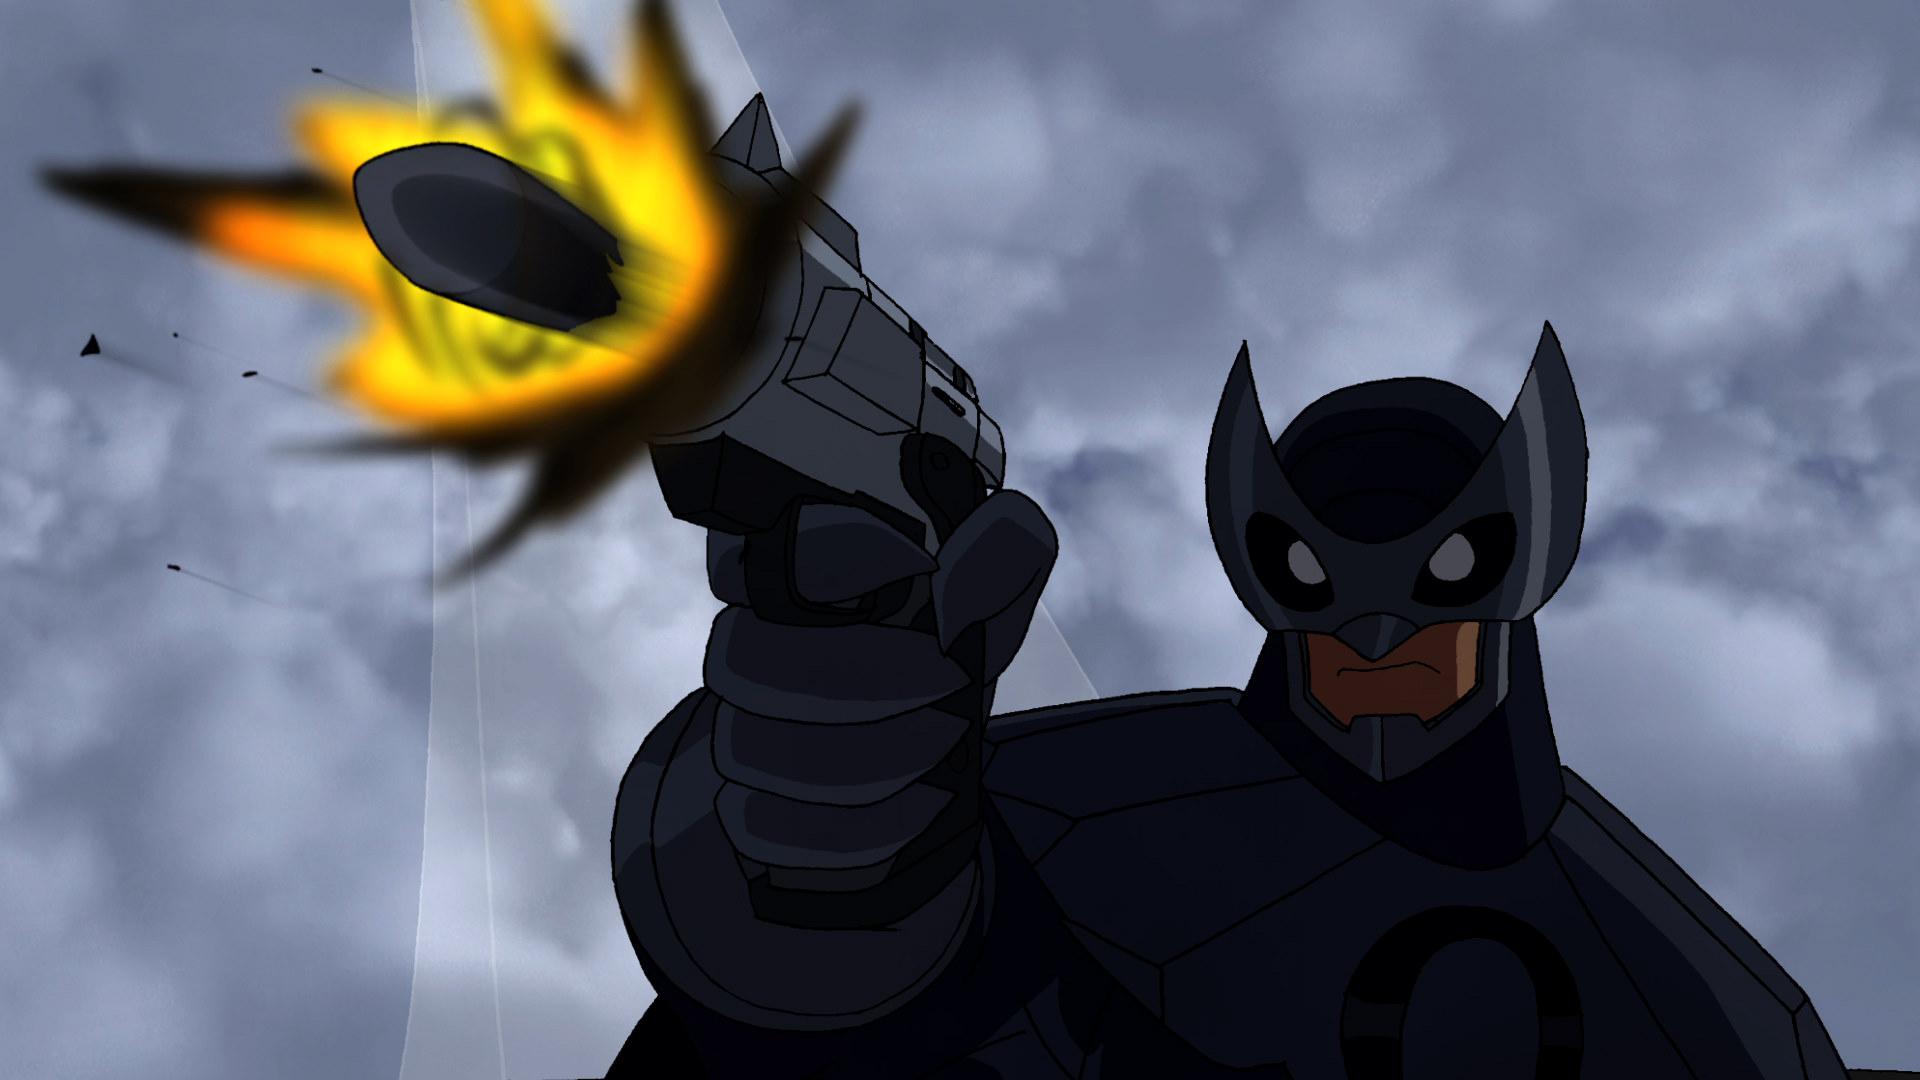 Owlman-Get Off My Plane! Owlman